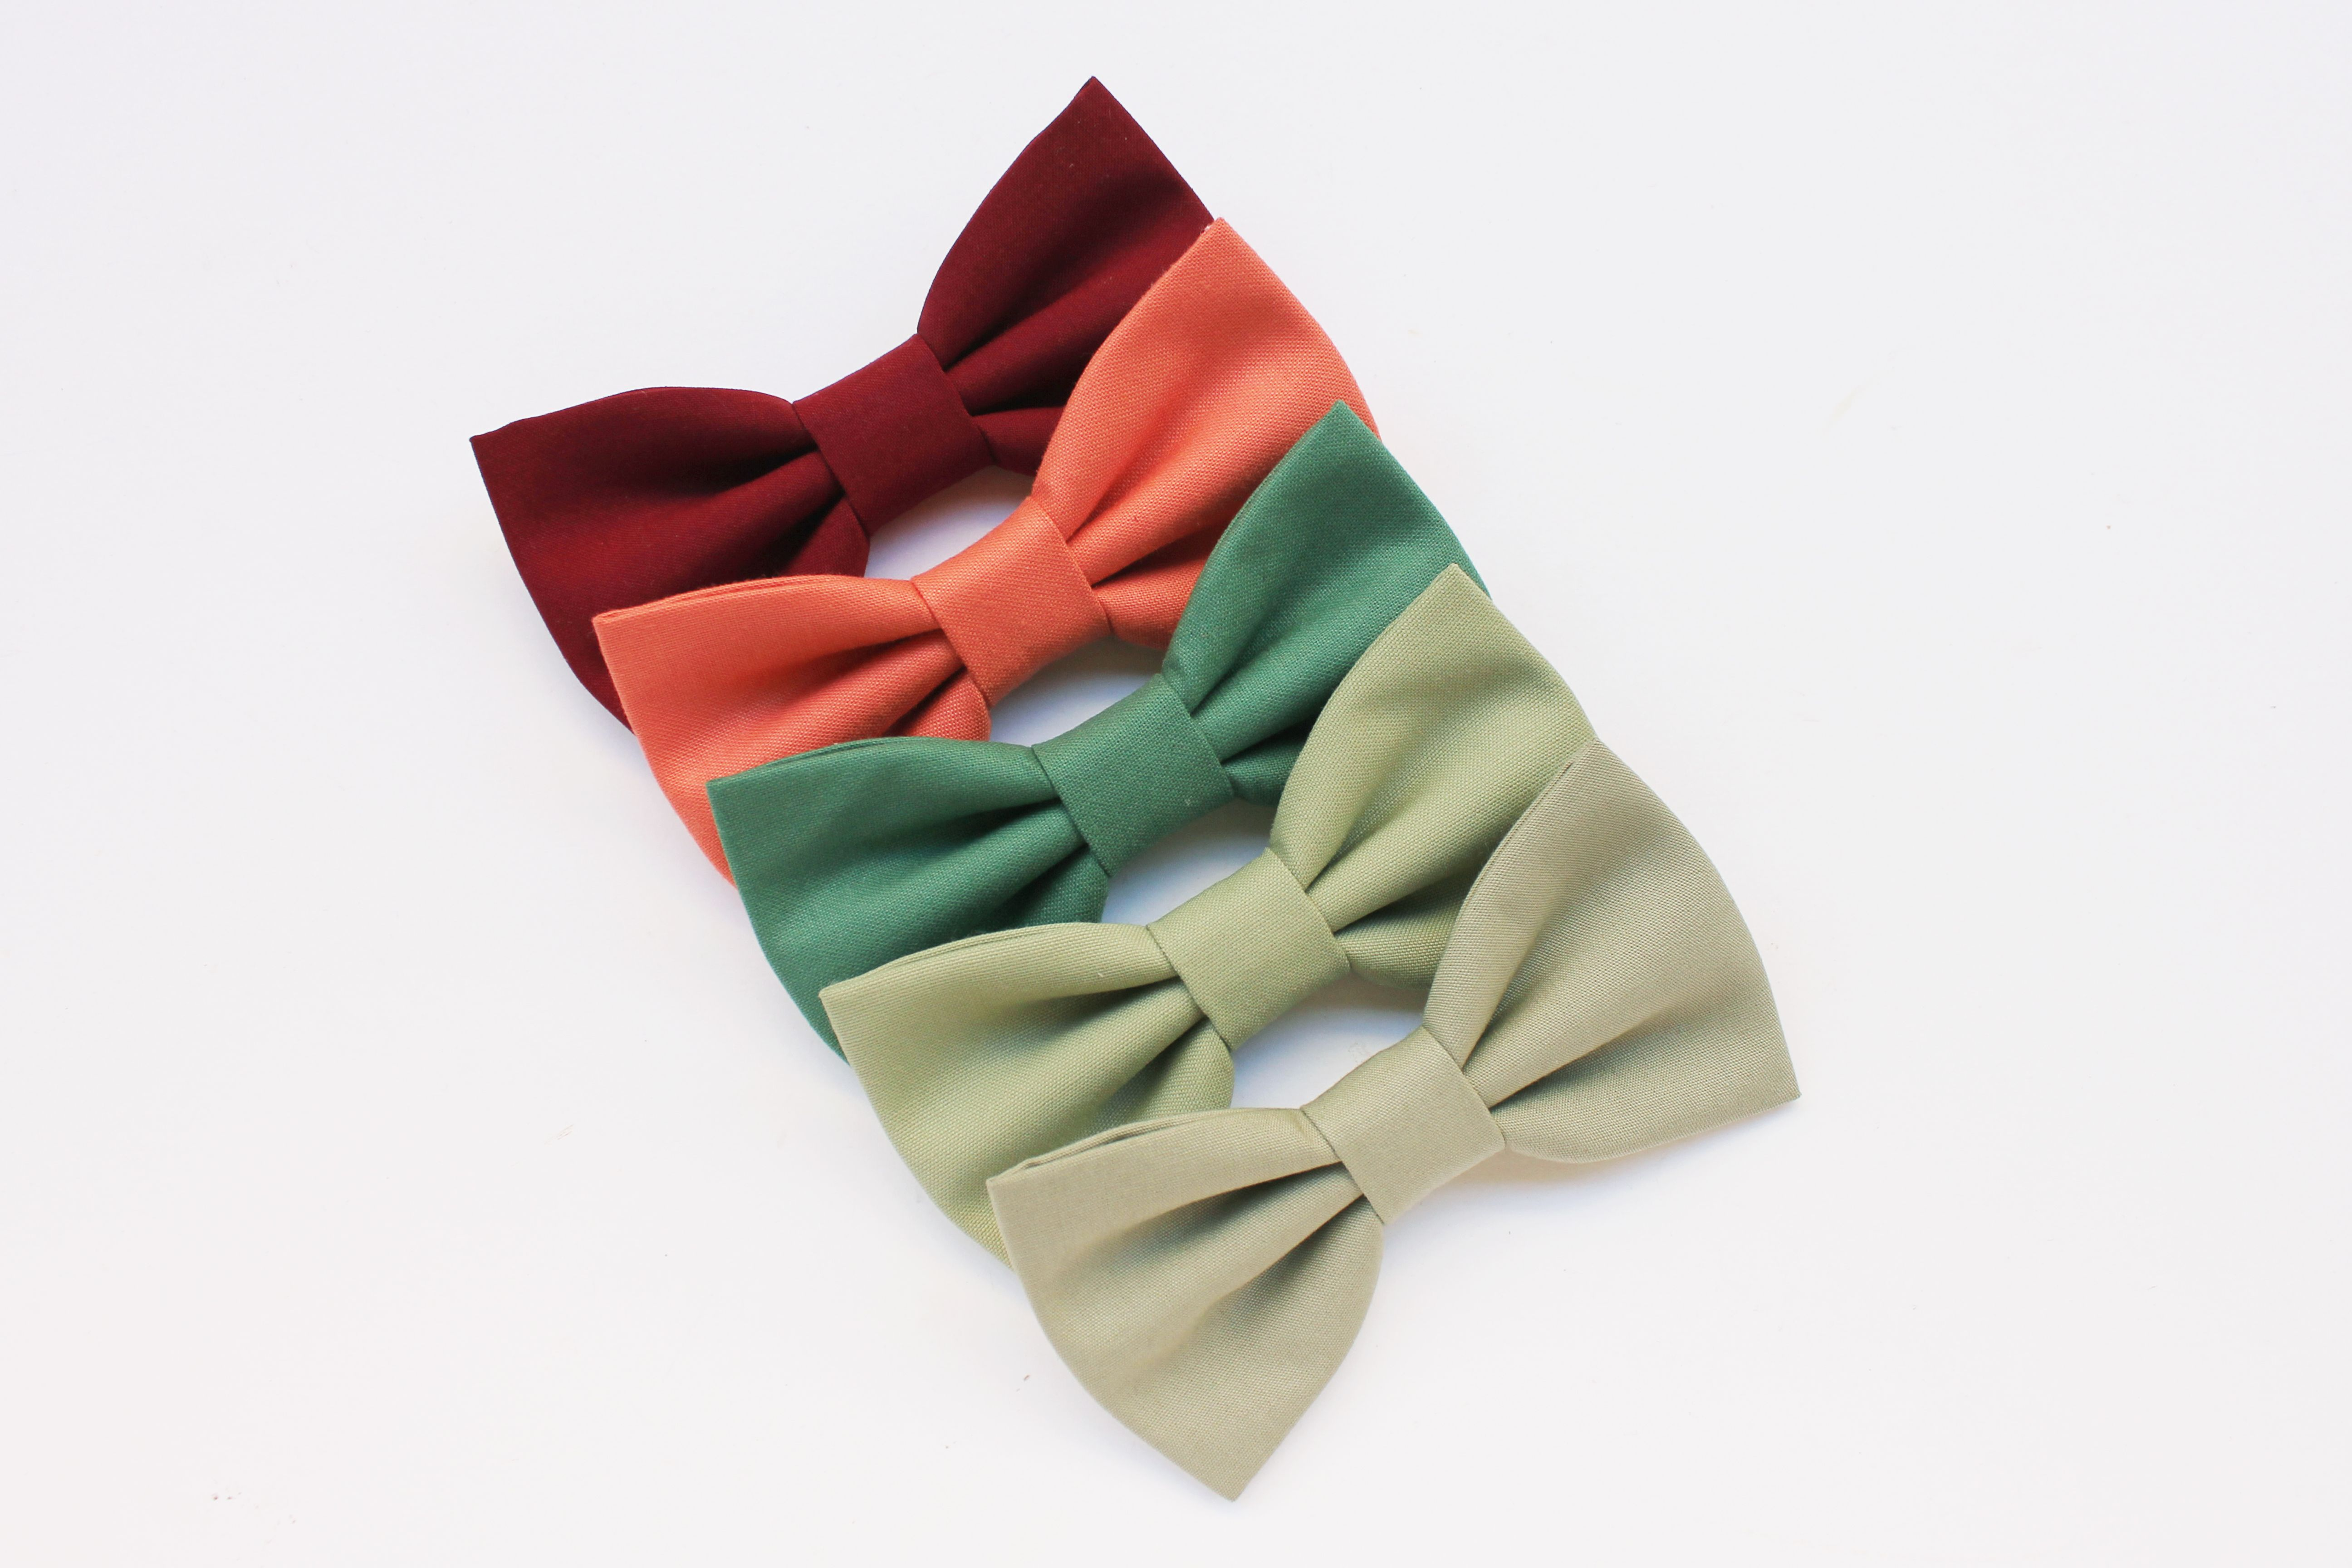 Bow tie for men color burgundy, burntorange, sage green, olive green, eucalyptus. Fall winter wedding inspiration 2020, color trend 2020, #colortrend2020 #colortrend #trendwedding #bohochicwedding #rusticwedding #bohemianwedding #vintagewedding #winterwedding #fallwedding #bowtie #bowtieforgroom #groomsmengift #sunsetwedding #sagewedding #burntorange #burntoragewedding #olivewedding #eucalyptuswedding #matrimonioinverno #matrimonio2020 #burgundyweddingtheme #burgundy #burgundybowtie #bridal2020